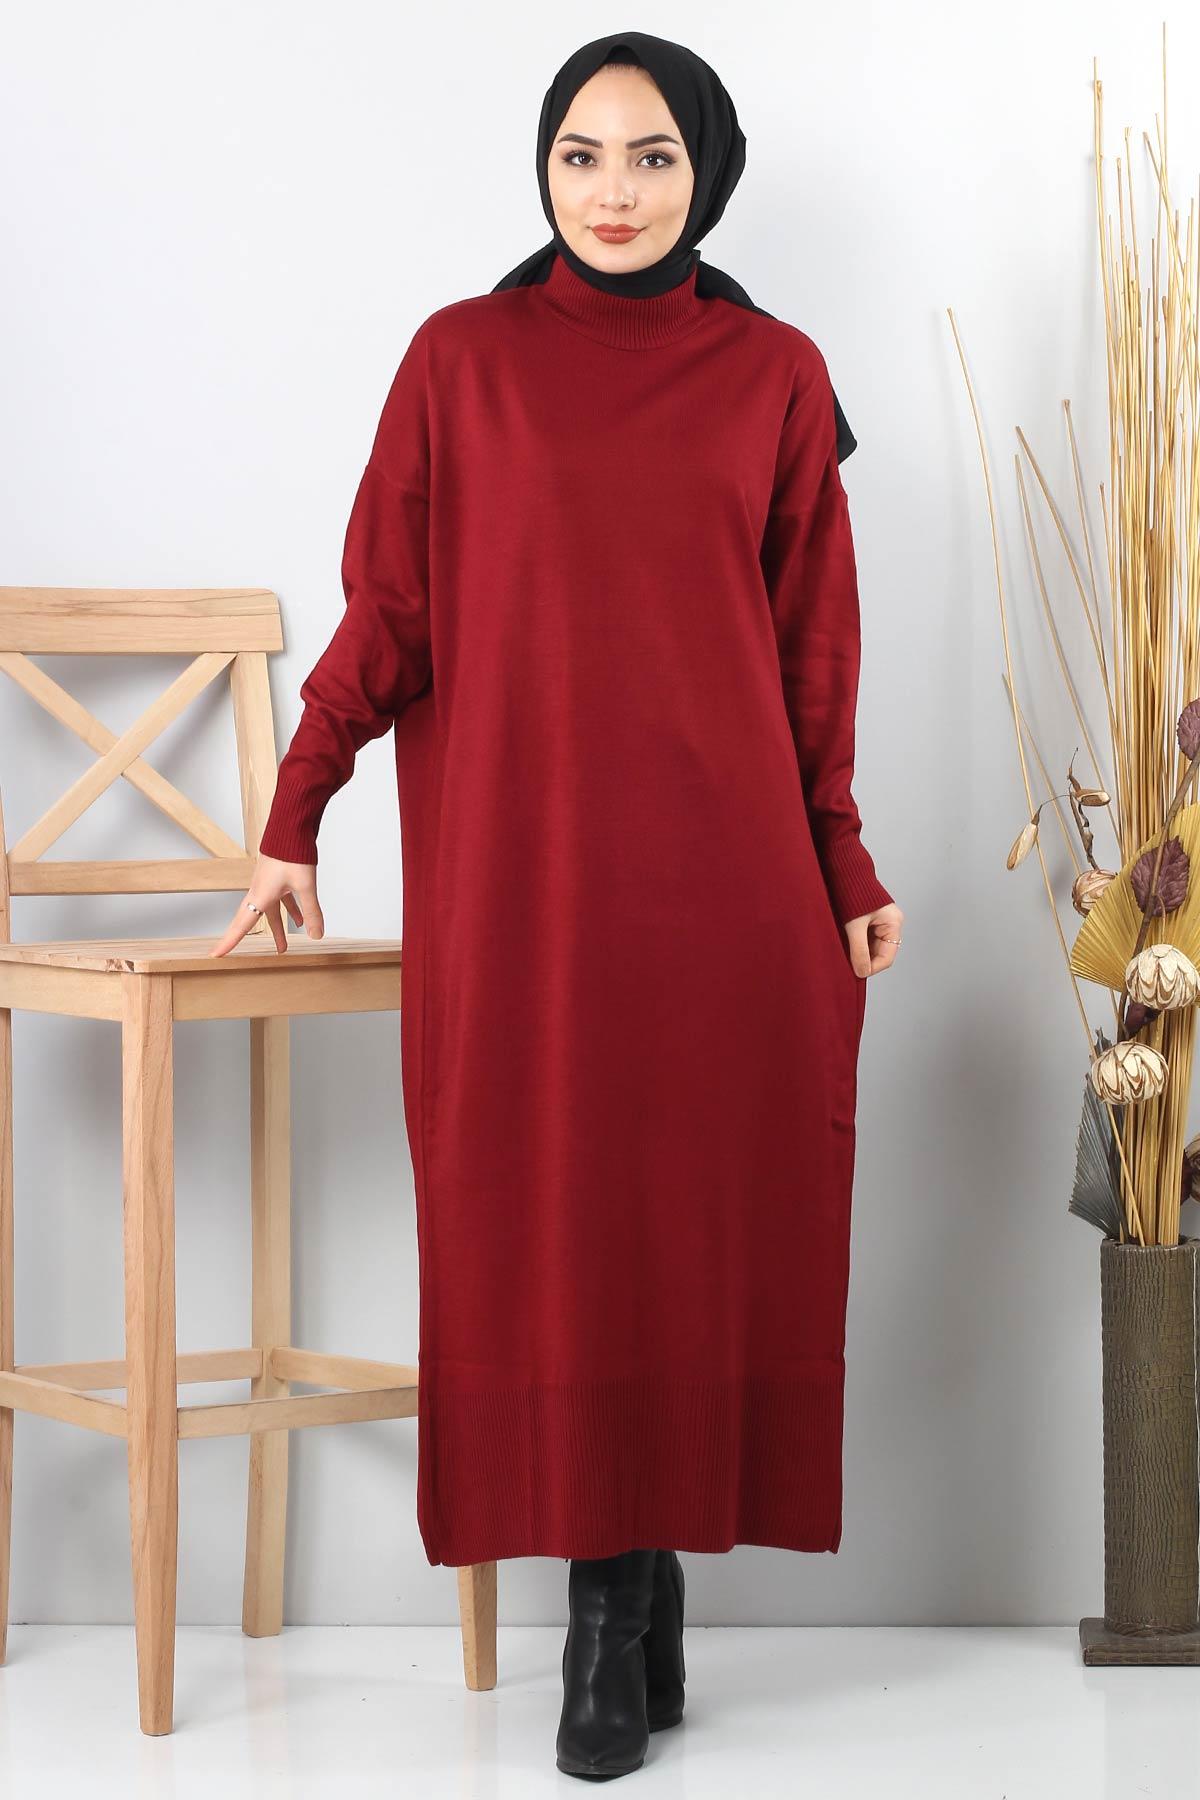 hijab 2021-Turkish dress hijabs fashion clothing shopping ...